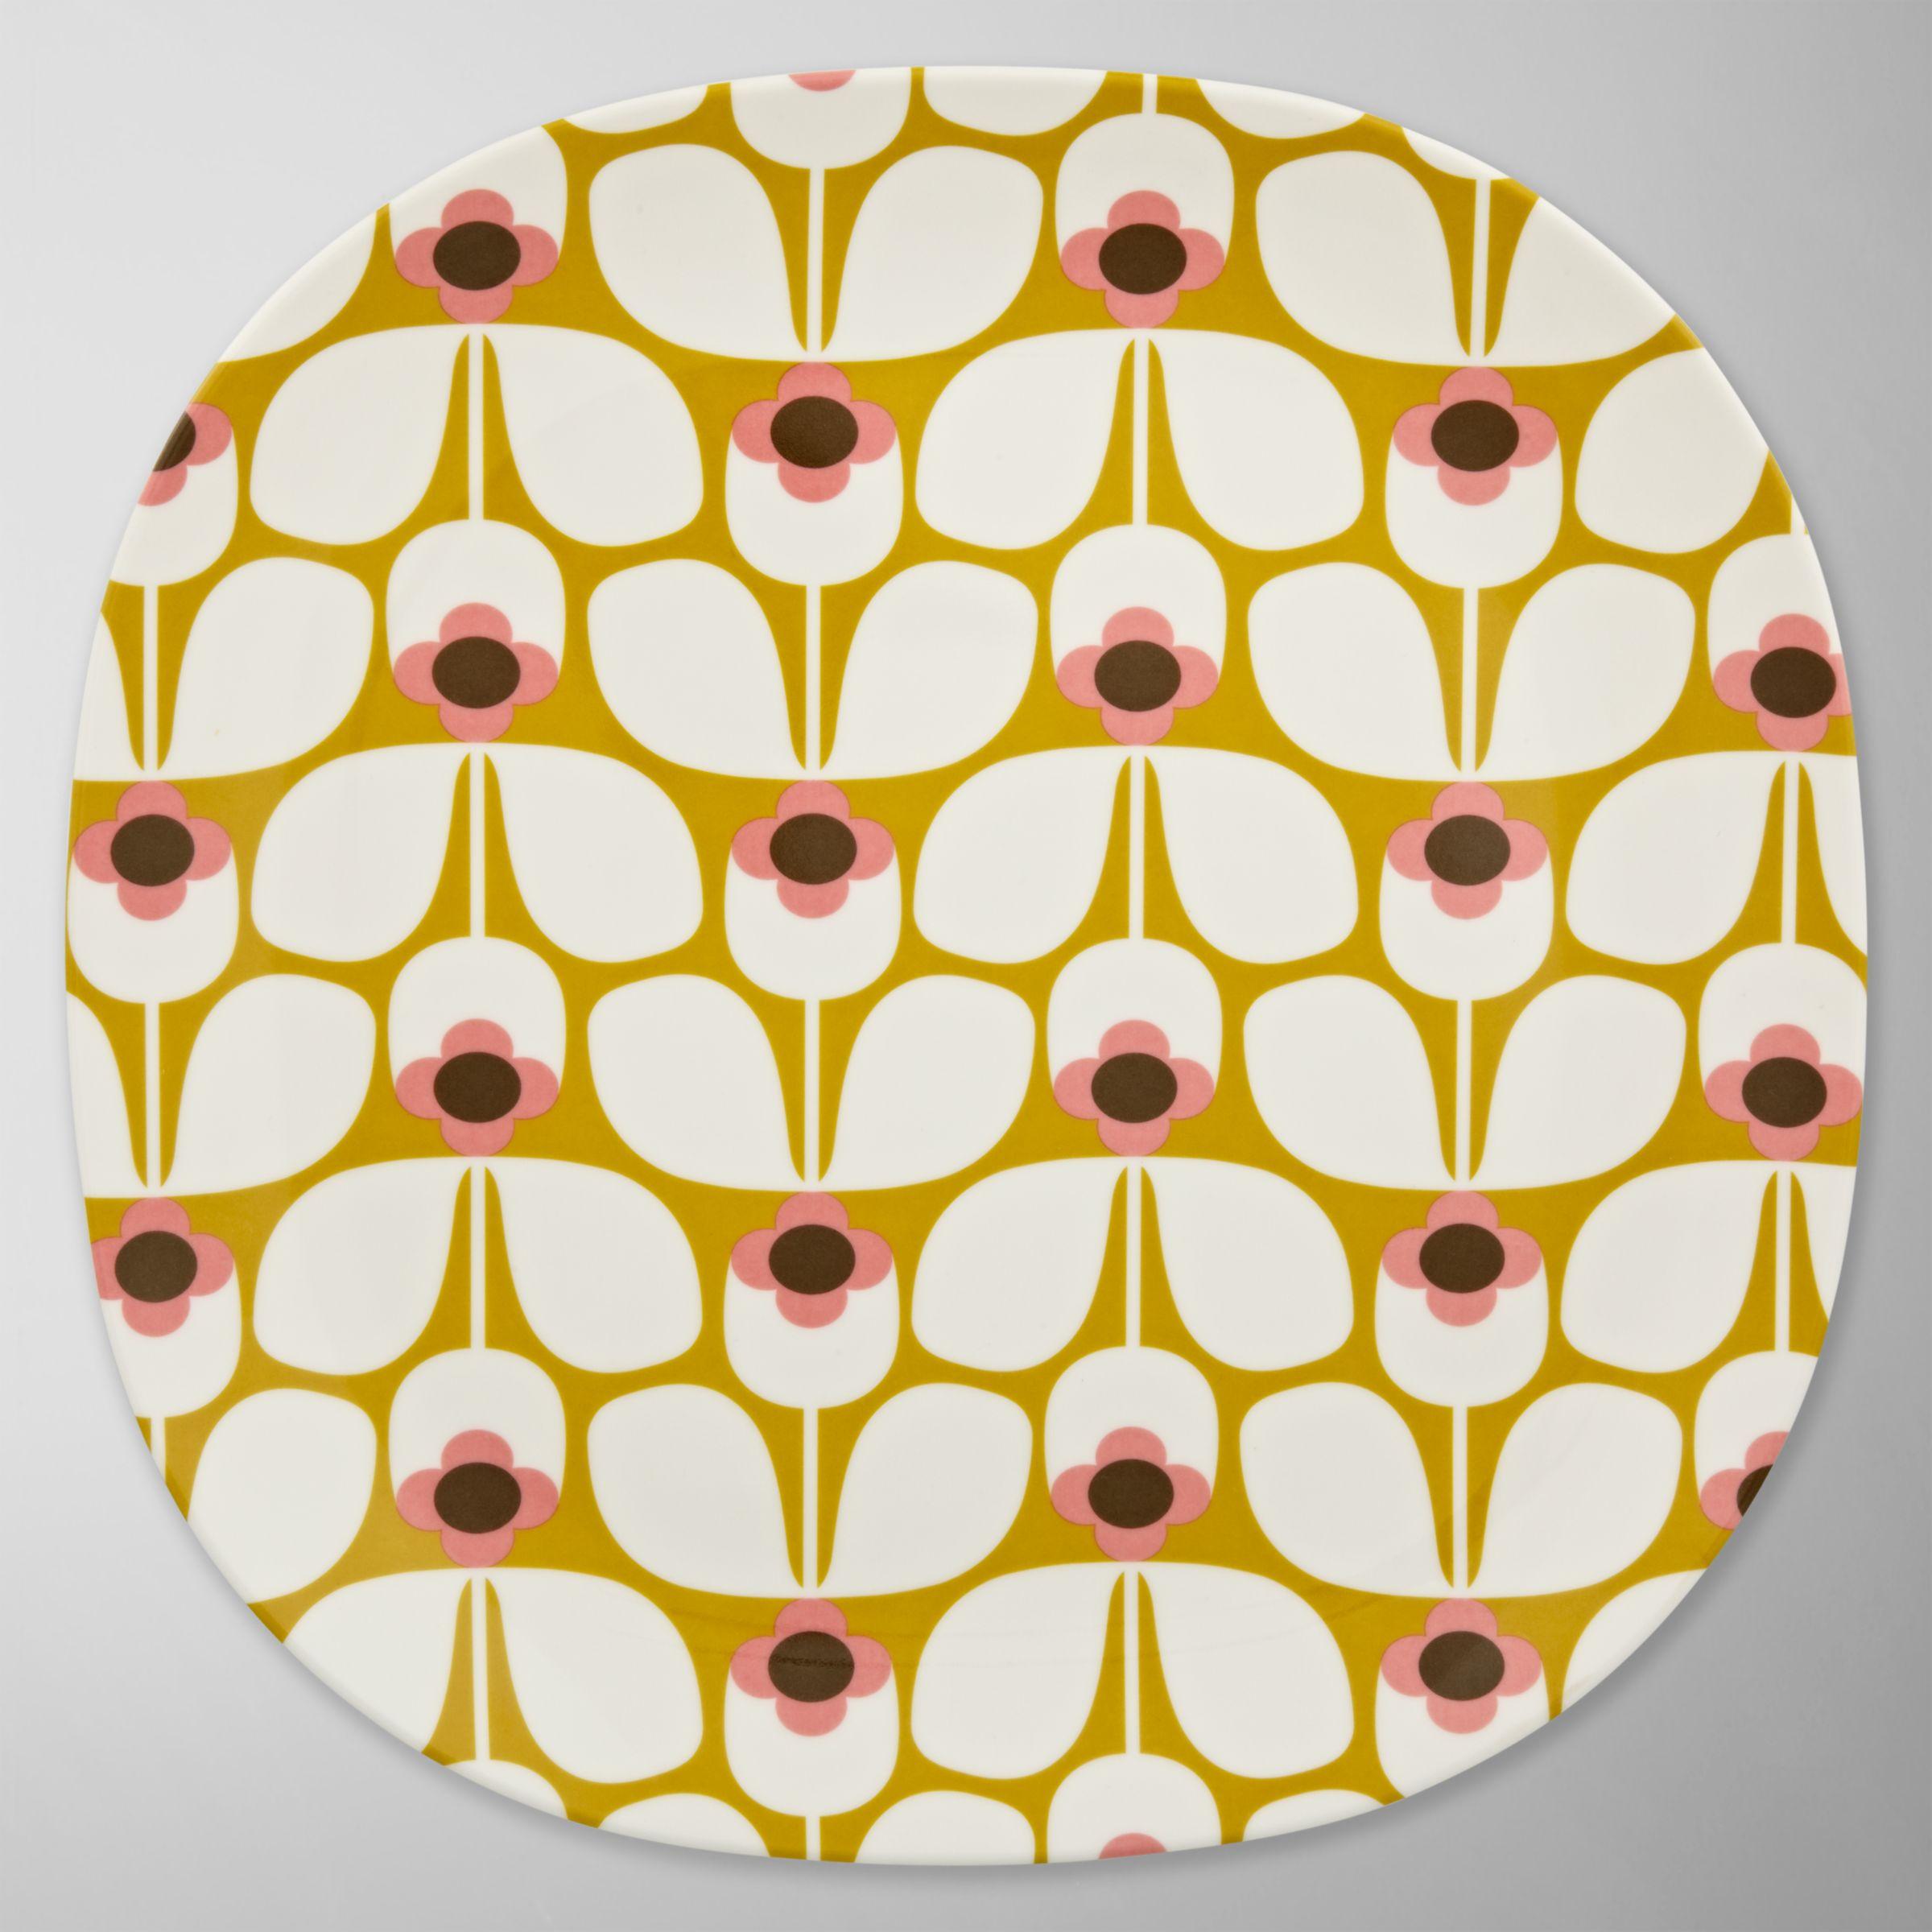 Orla Kiely Melamine Dinner Plate, Dia.26cm